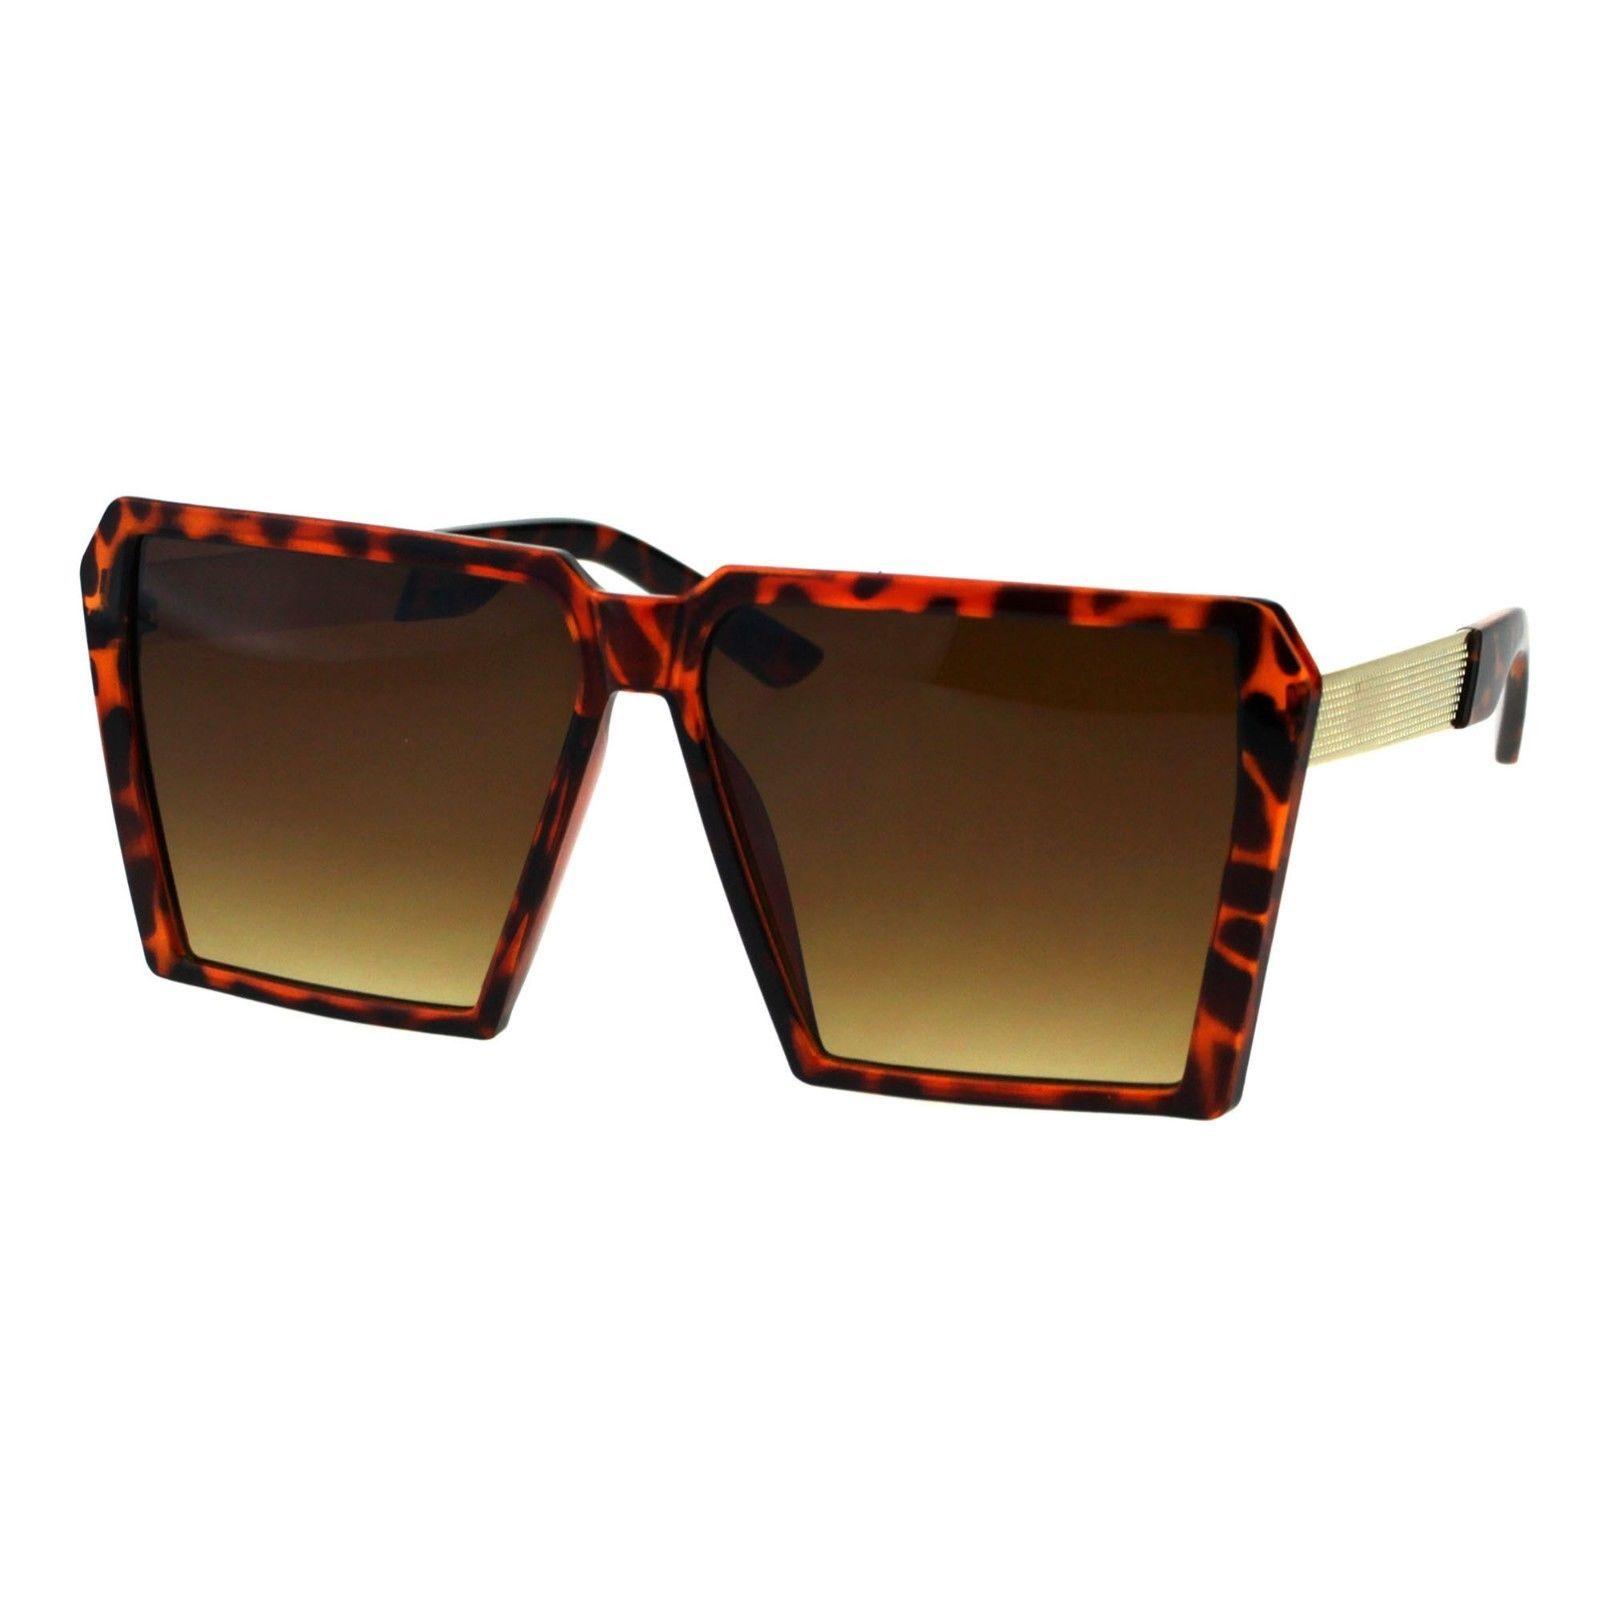 Womens Super Oversized Sunglasses Square Trapezoid Frame UV 400